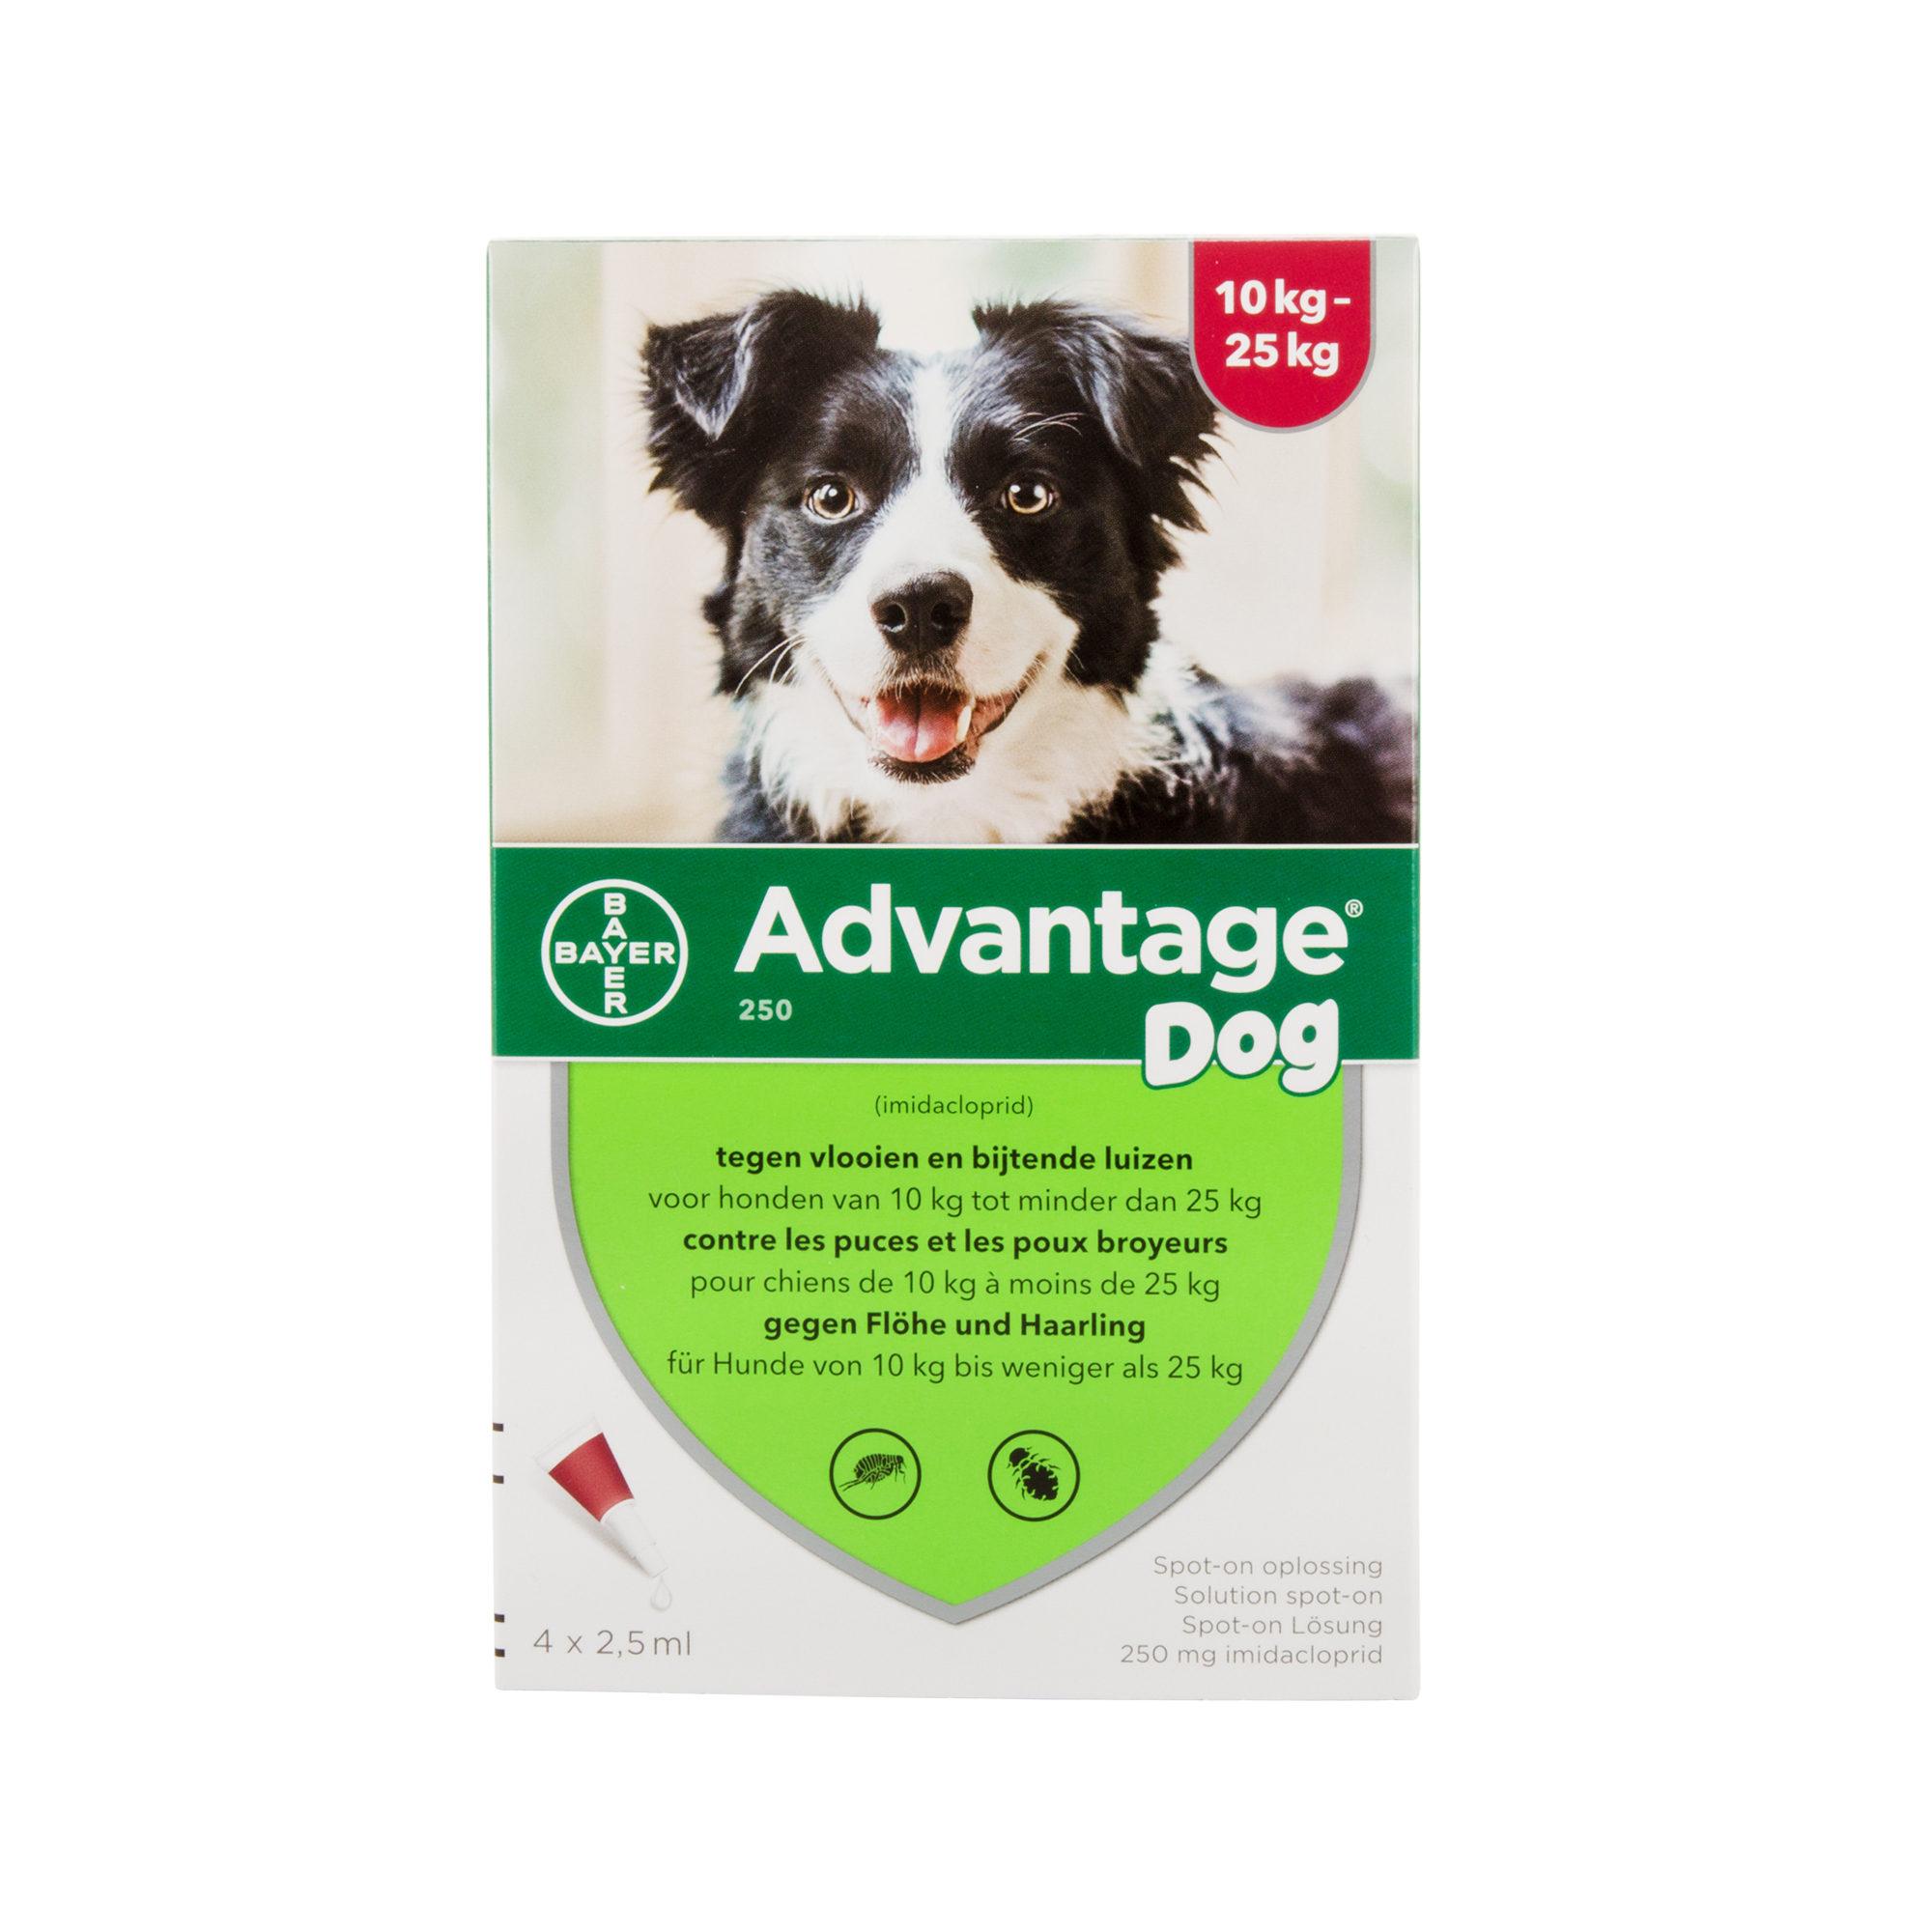 Advantage 250 Hund - 10 - 25 kg